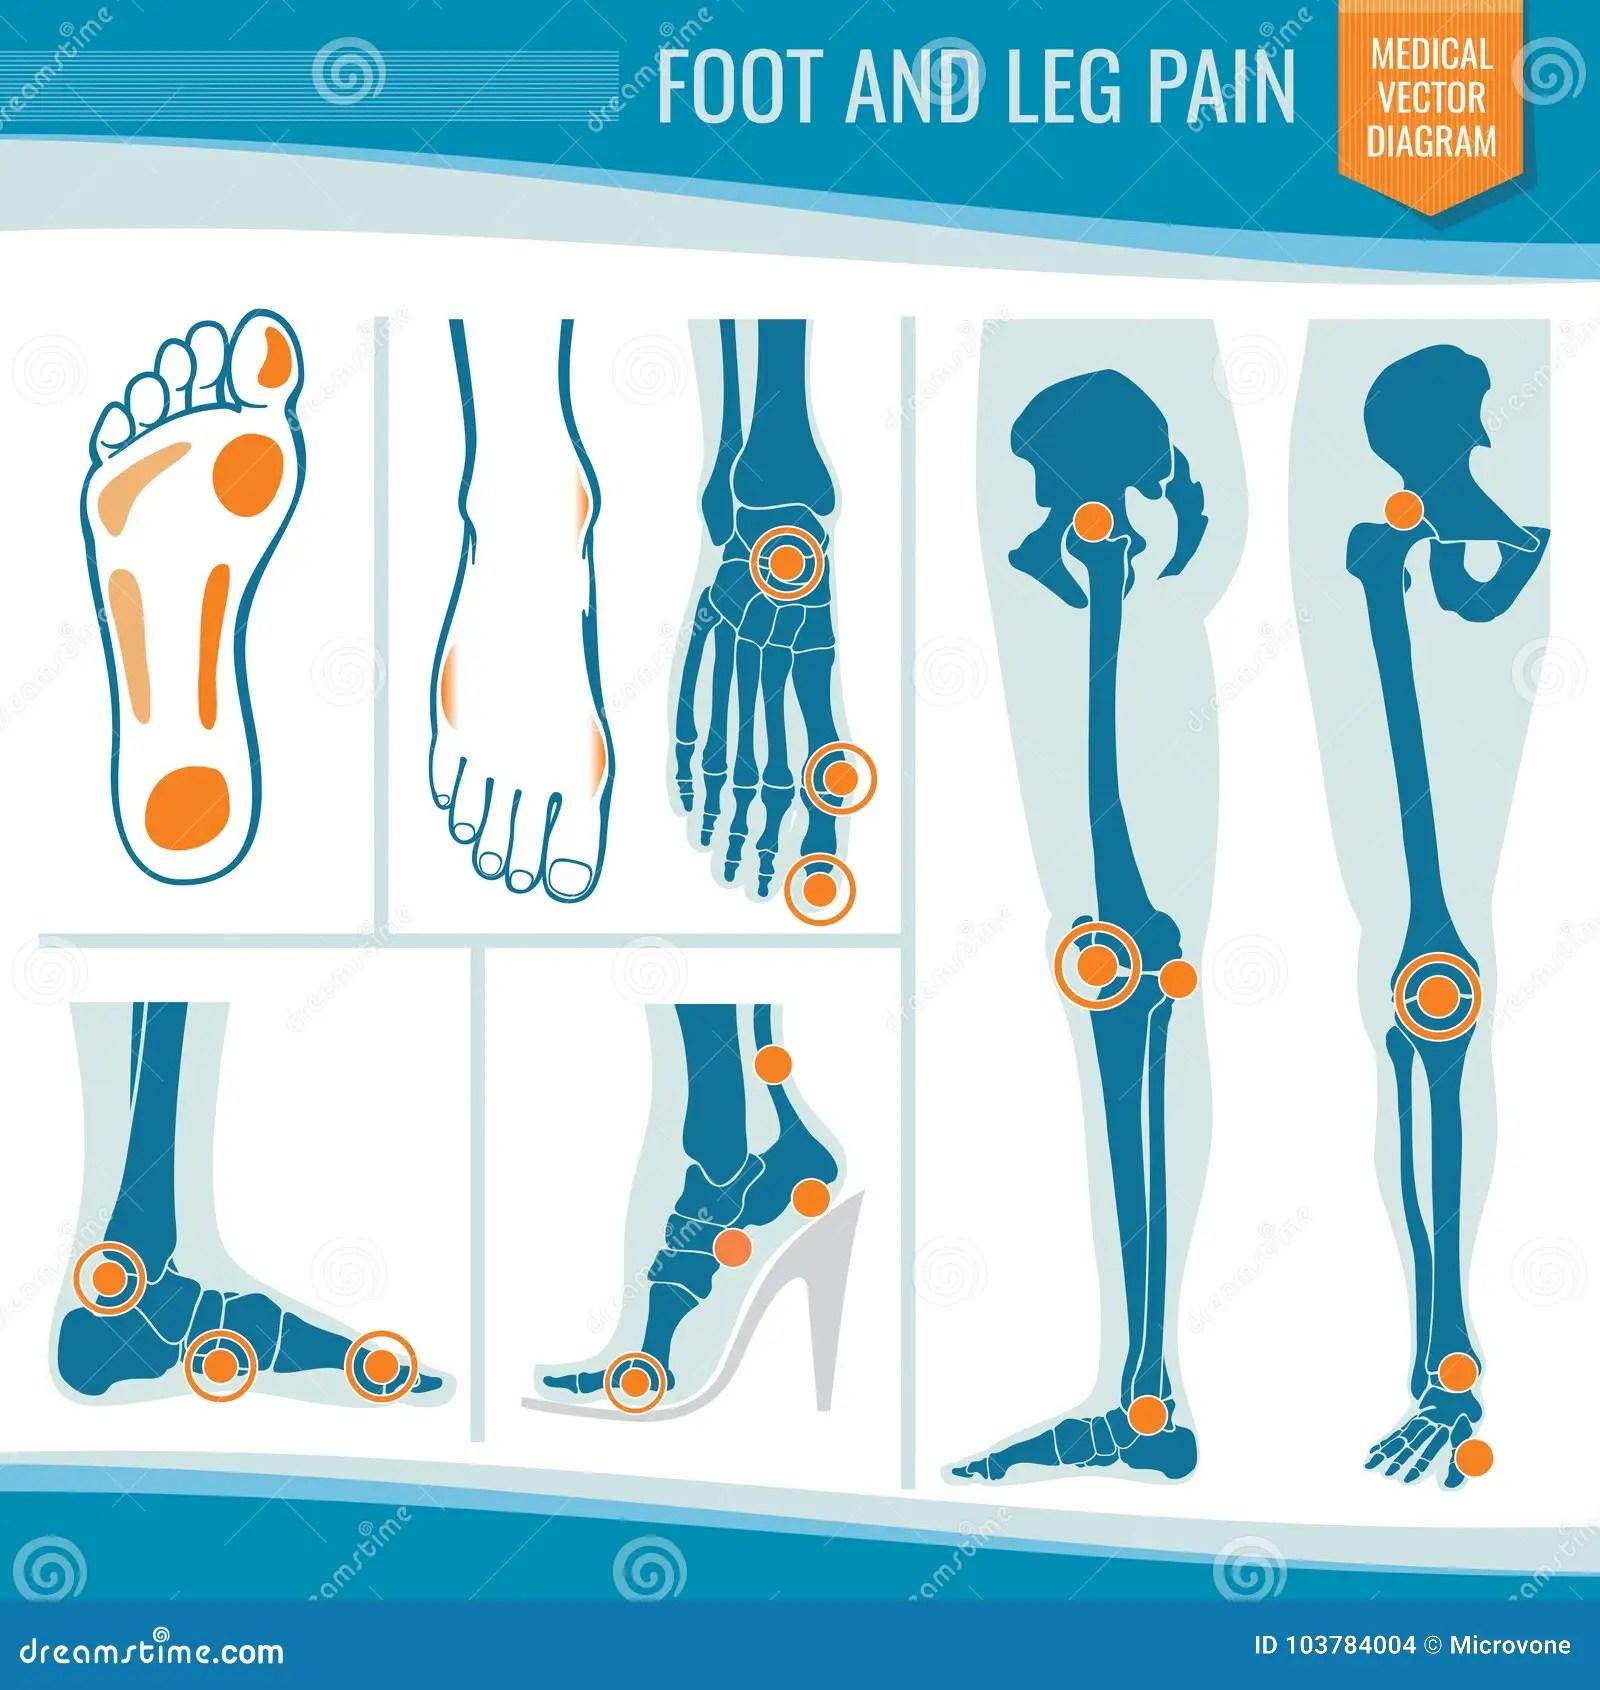 hight resolution of foot and leg pain arthritis and rheumatism orthopedic medical vector diagram